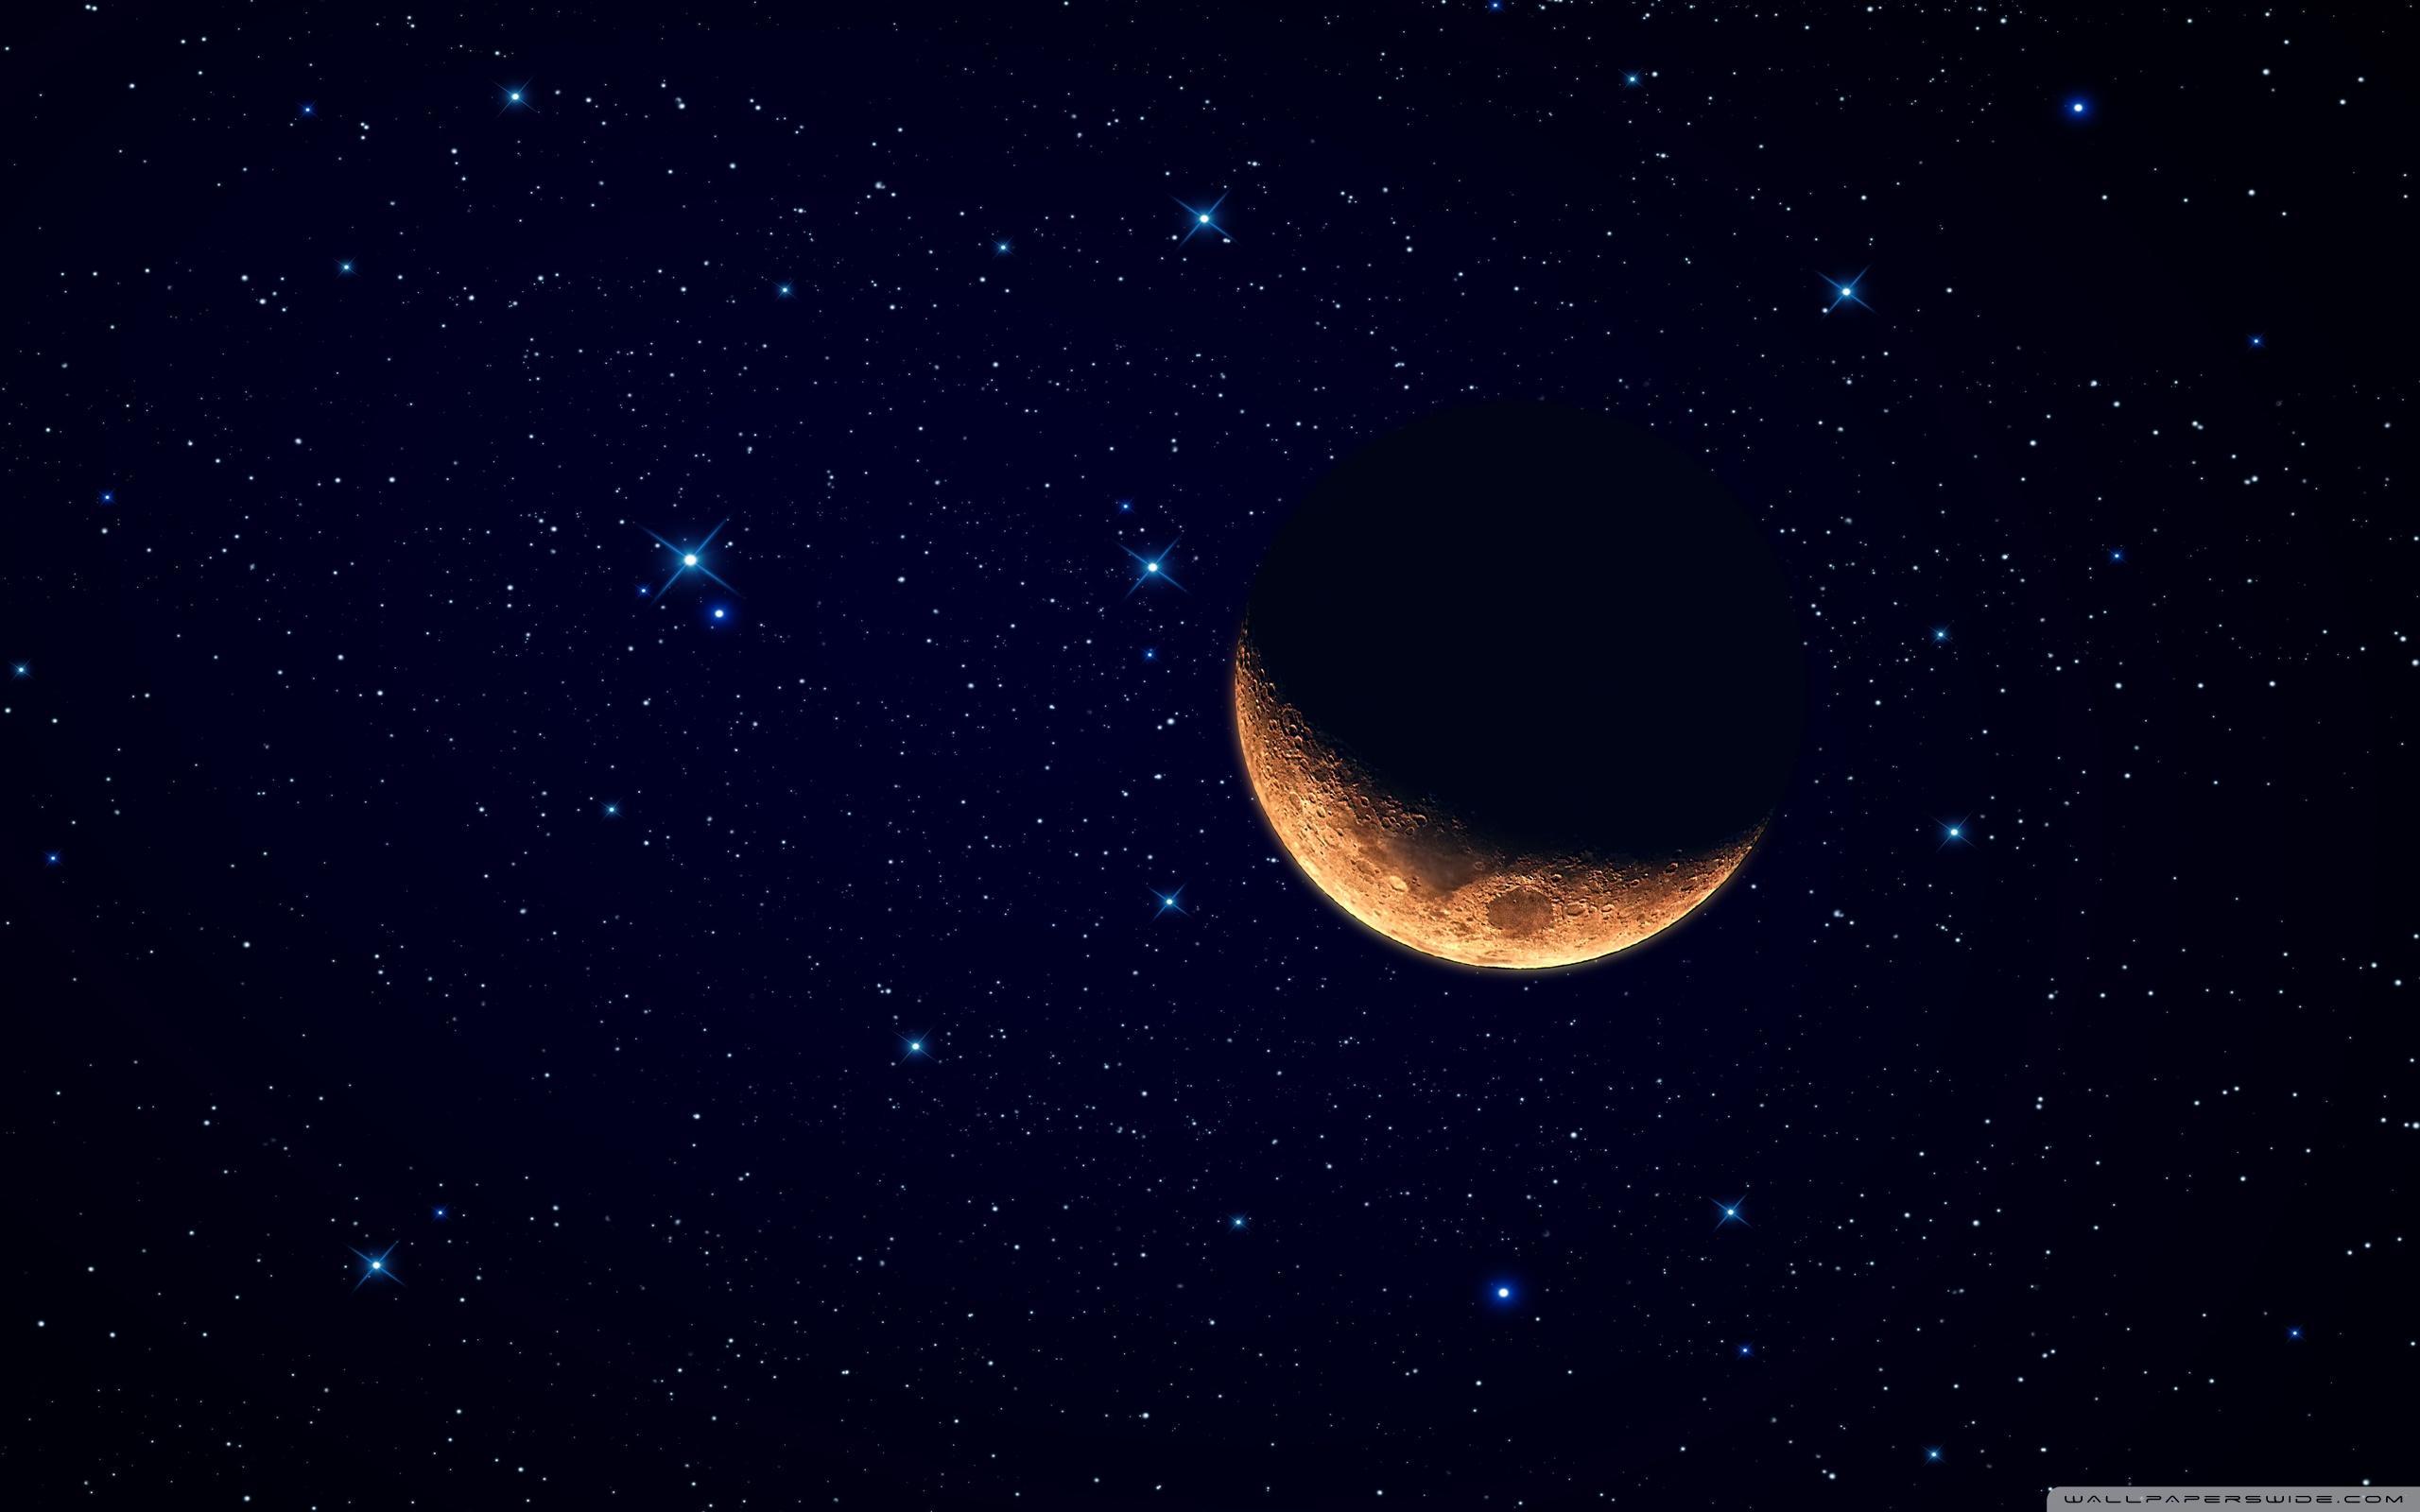 Moon Waning Crescent ❤ 4K HD Desktop Wallpaper for 4K Ultra HD TV .